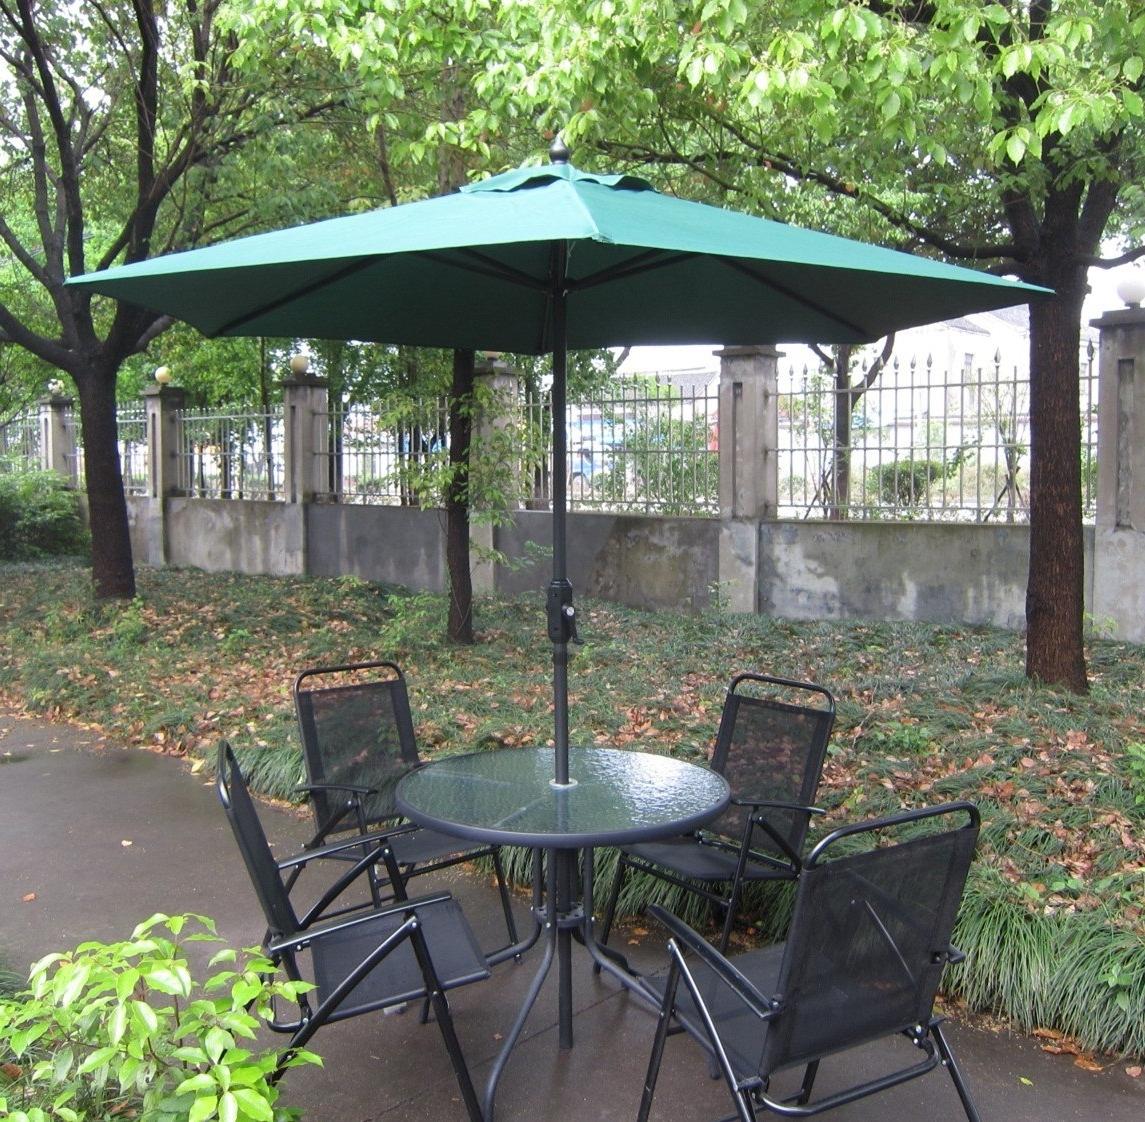 European Patio Umbrellas Regarding Well Known European Umbrella Outdoor Umbrellas Uv Sun Base Iron Pillar Holder (View 9 of 20)